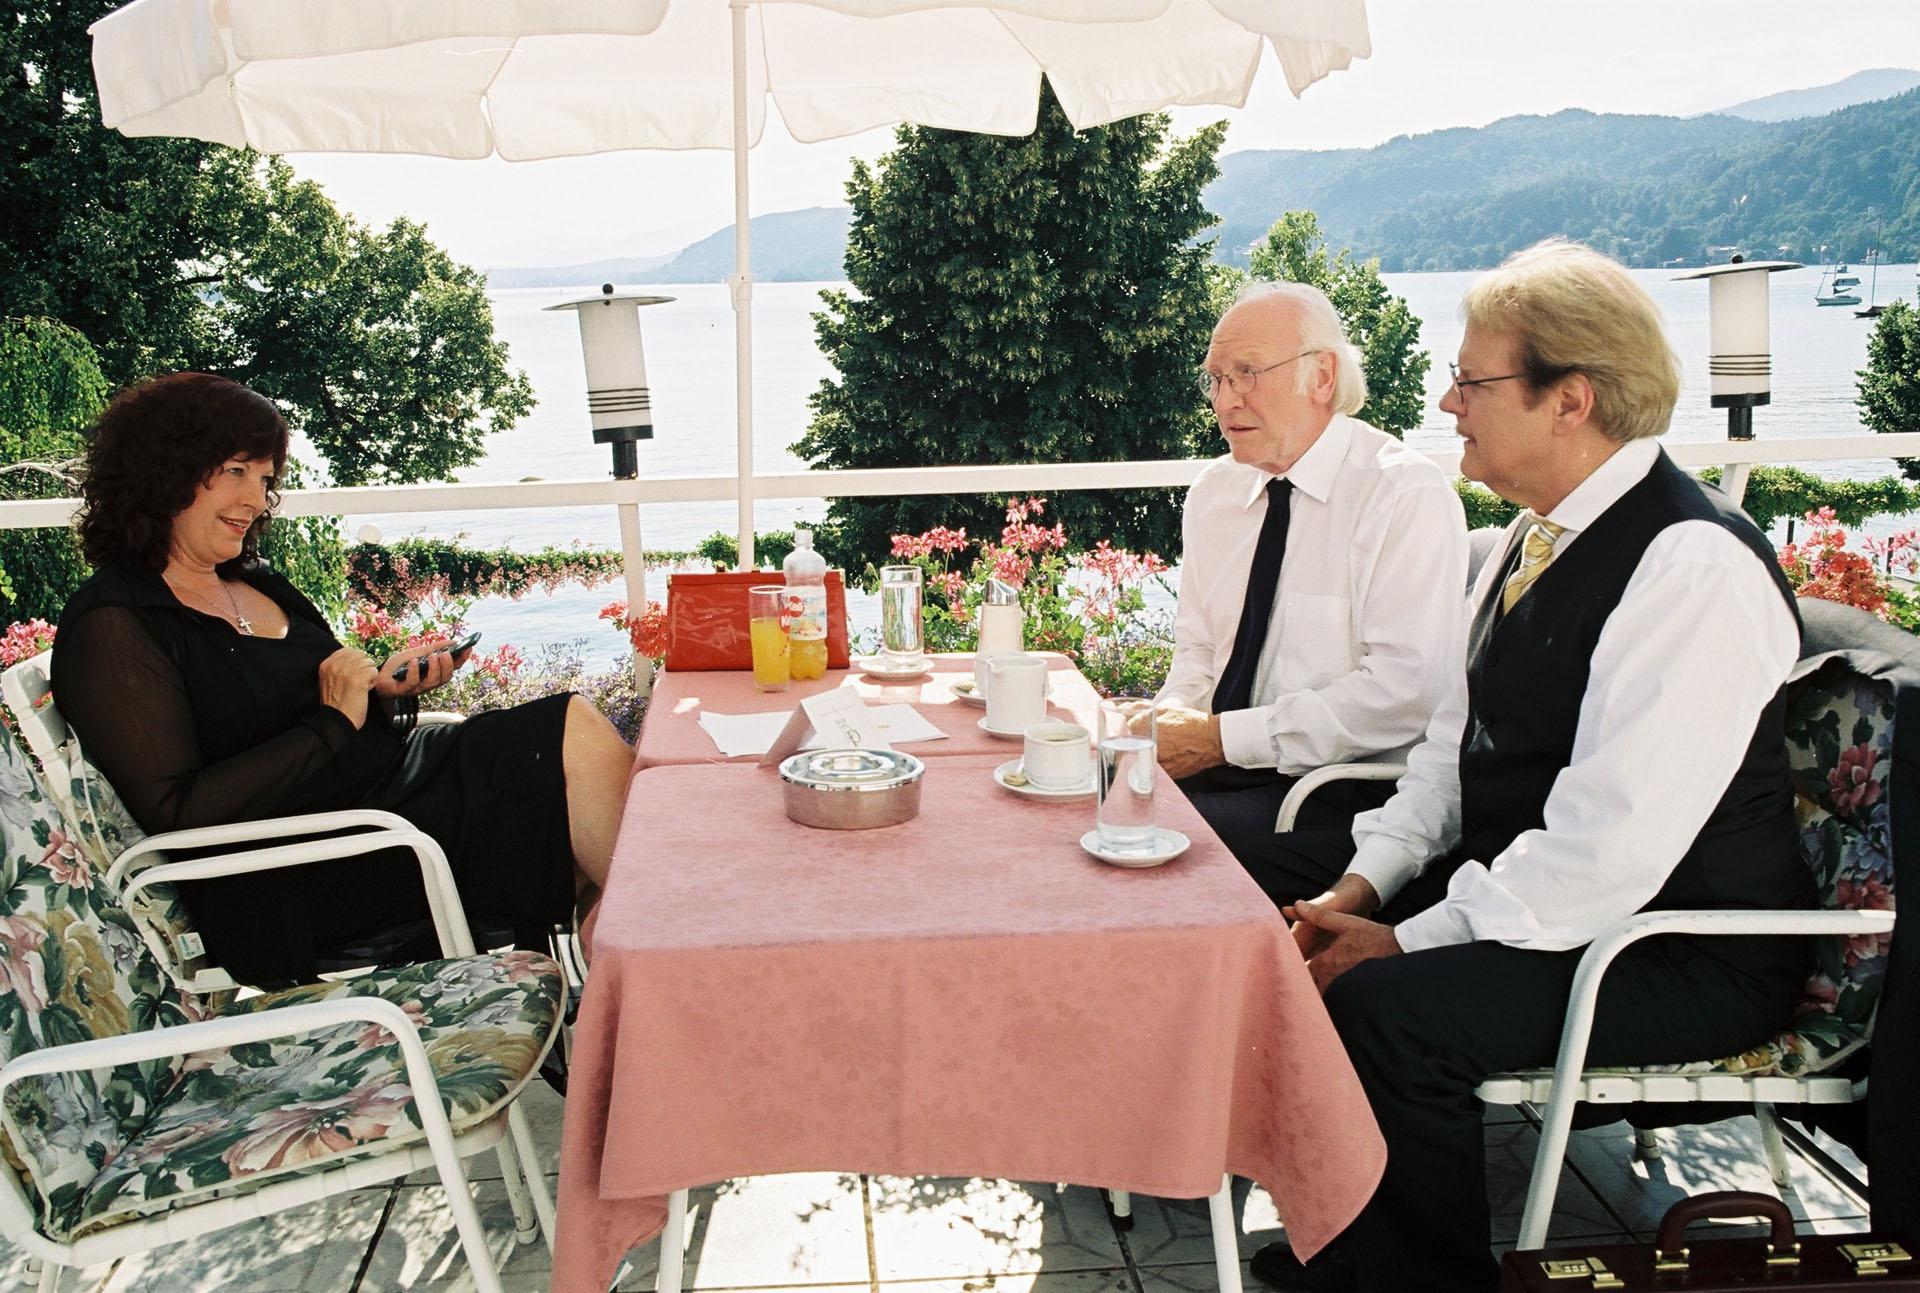 © Star*Film / Wolfgang Fuhrmann (Star*Film) - Elfi Eschke, Karl Merkatz, Peter Fricke